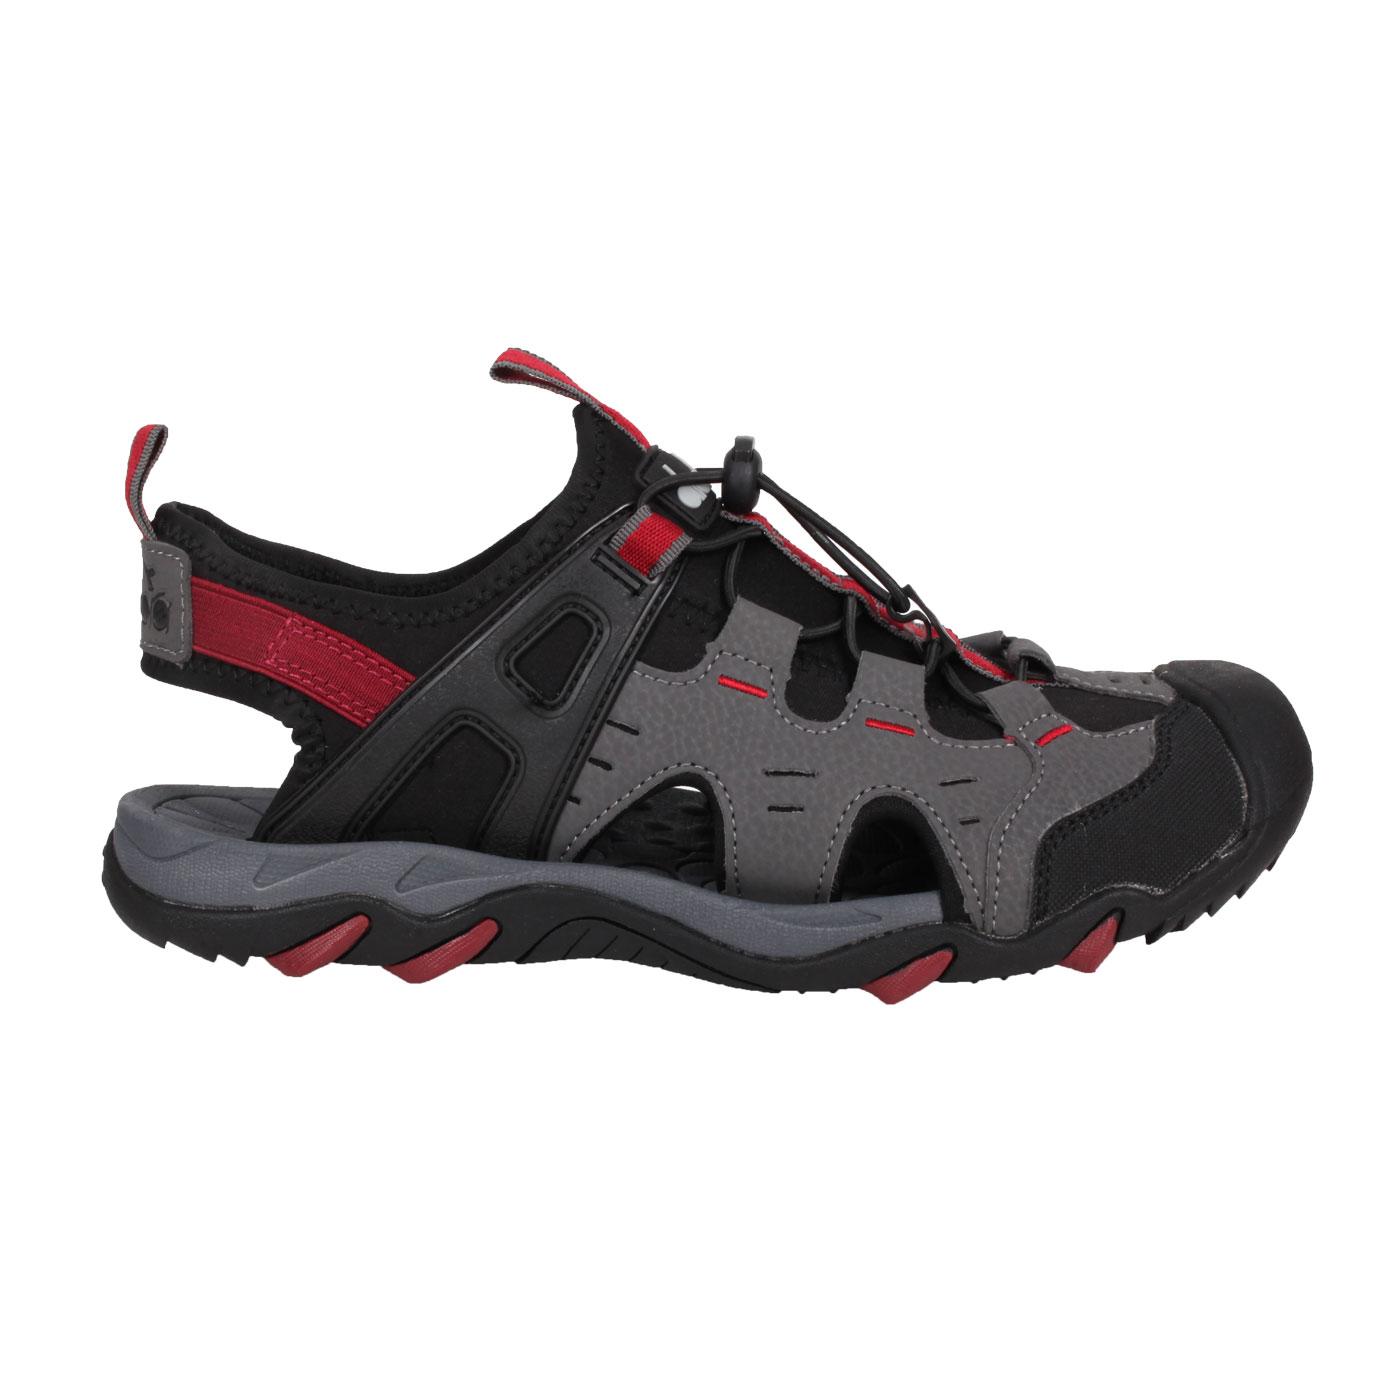 DIADORA 男款護趾運動涼鞋 DA71201 - 灰黑紅